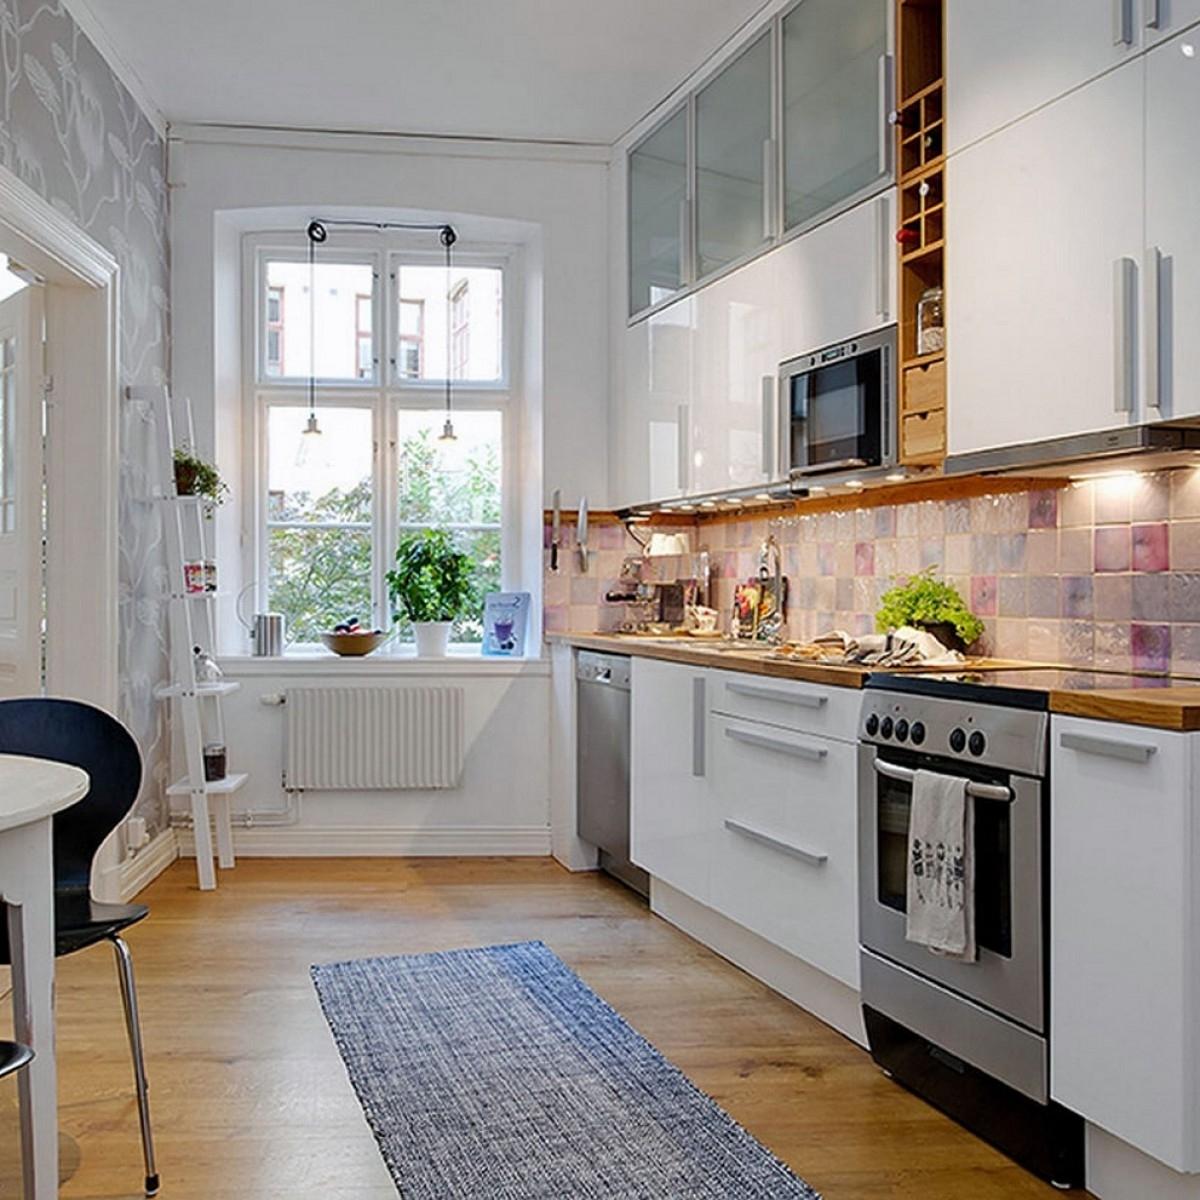 Open kitchen in home